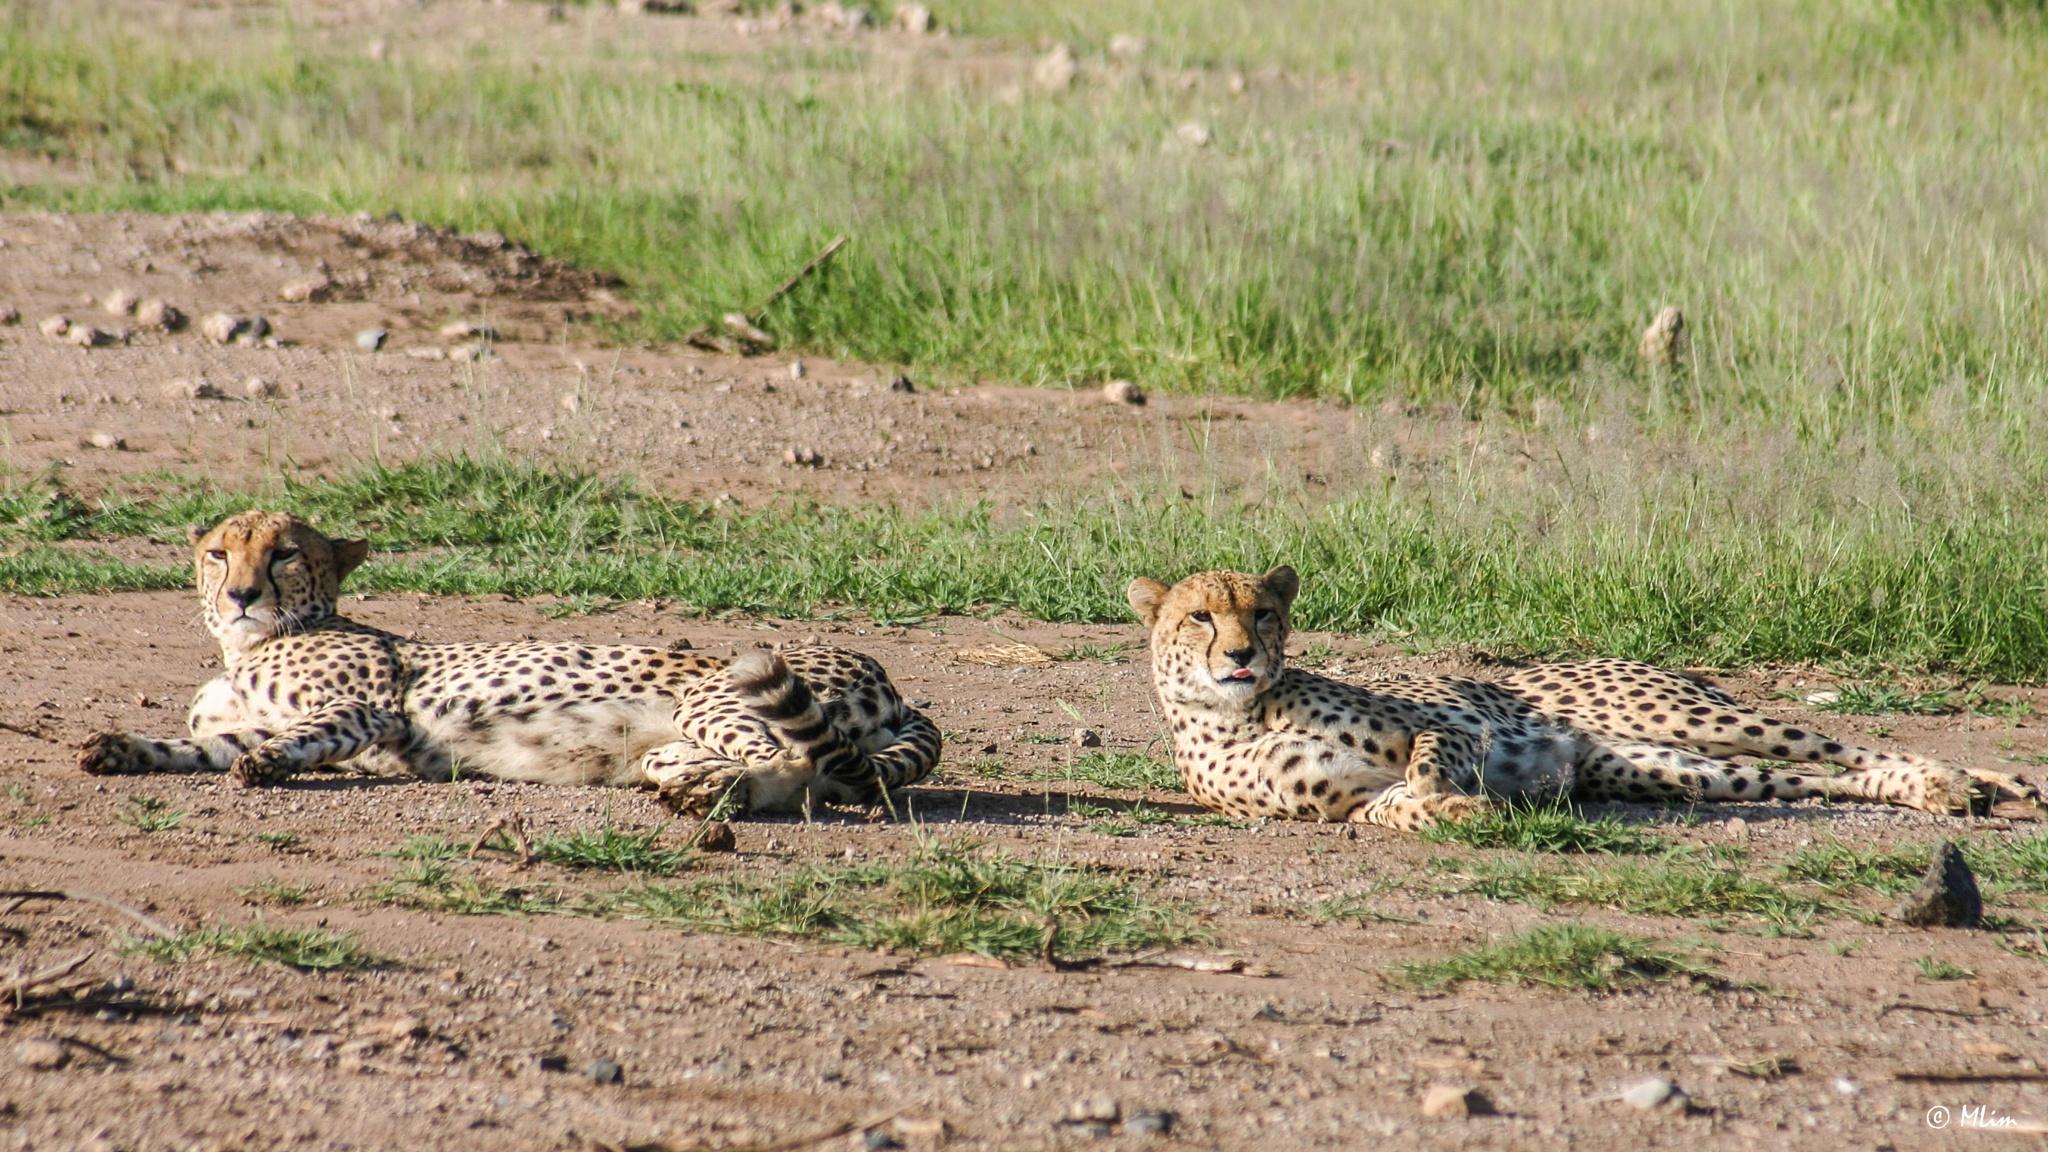 A pair of Cheetahs by Meng Lim